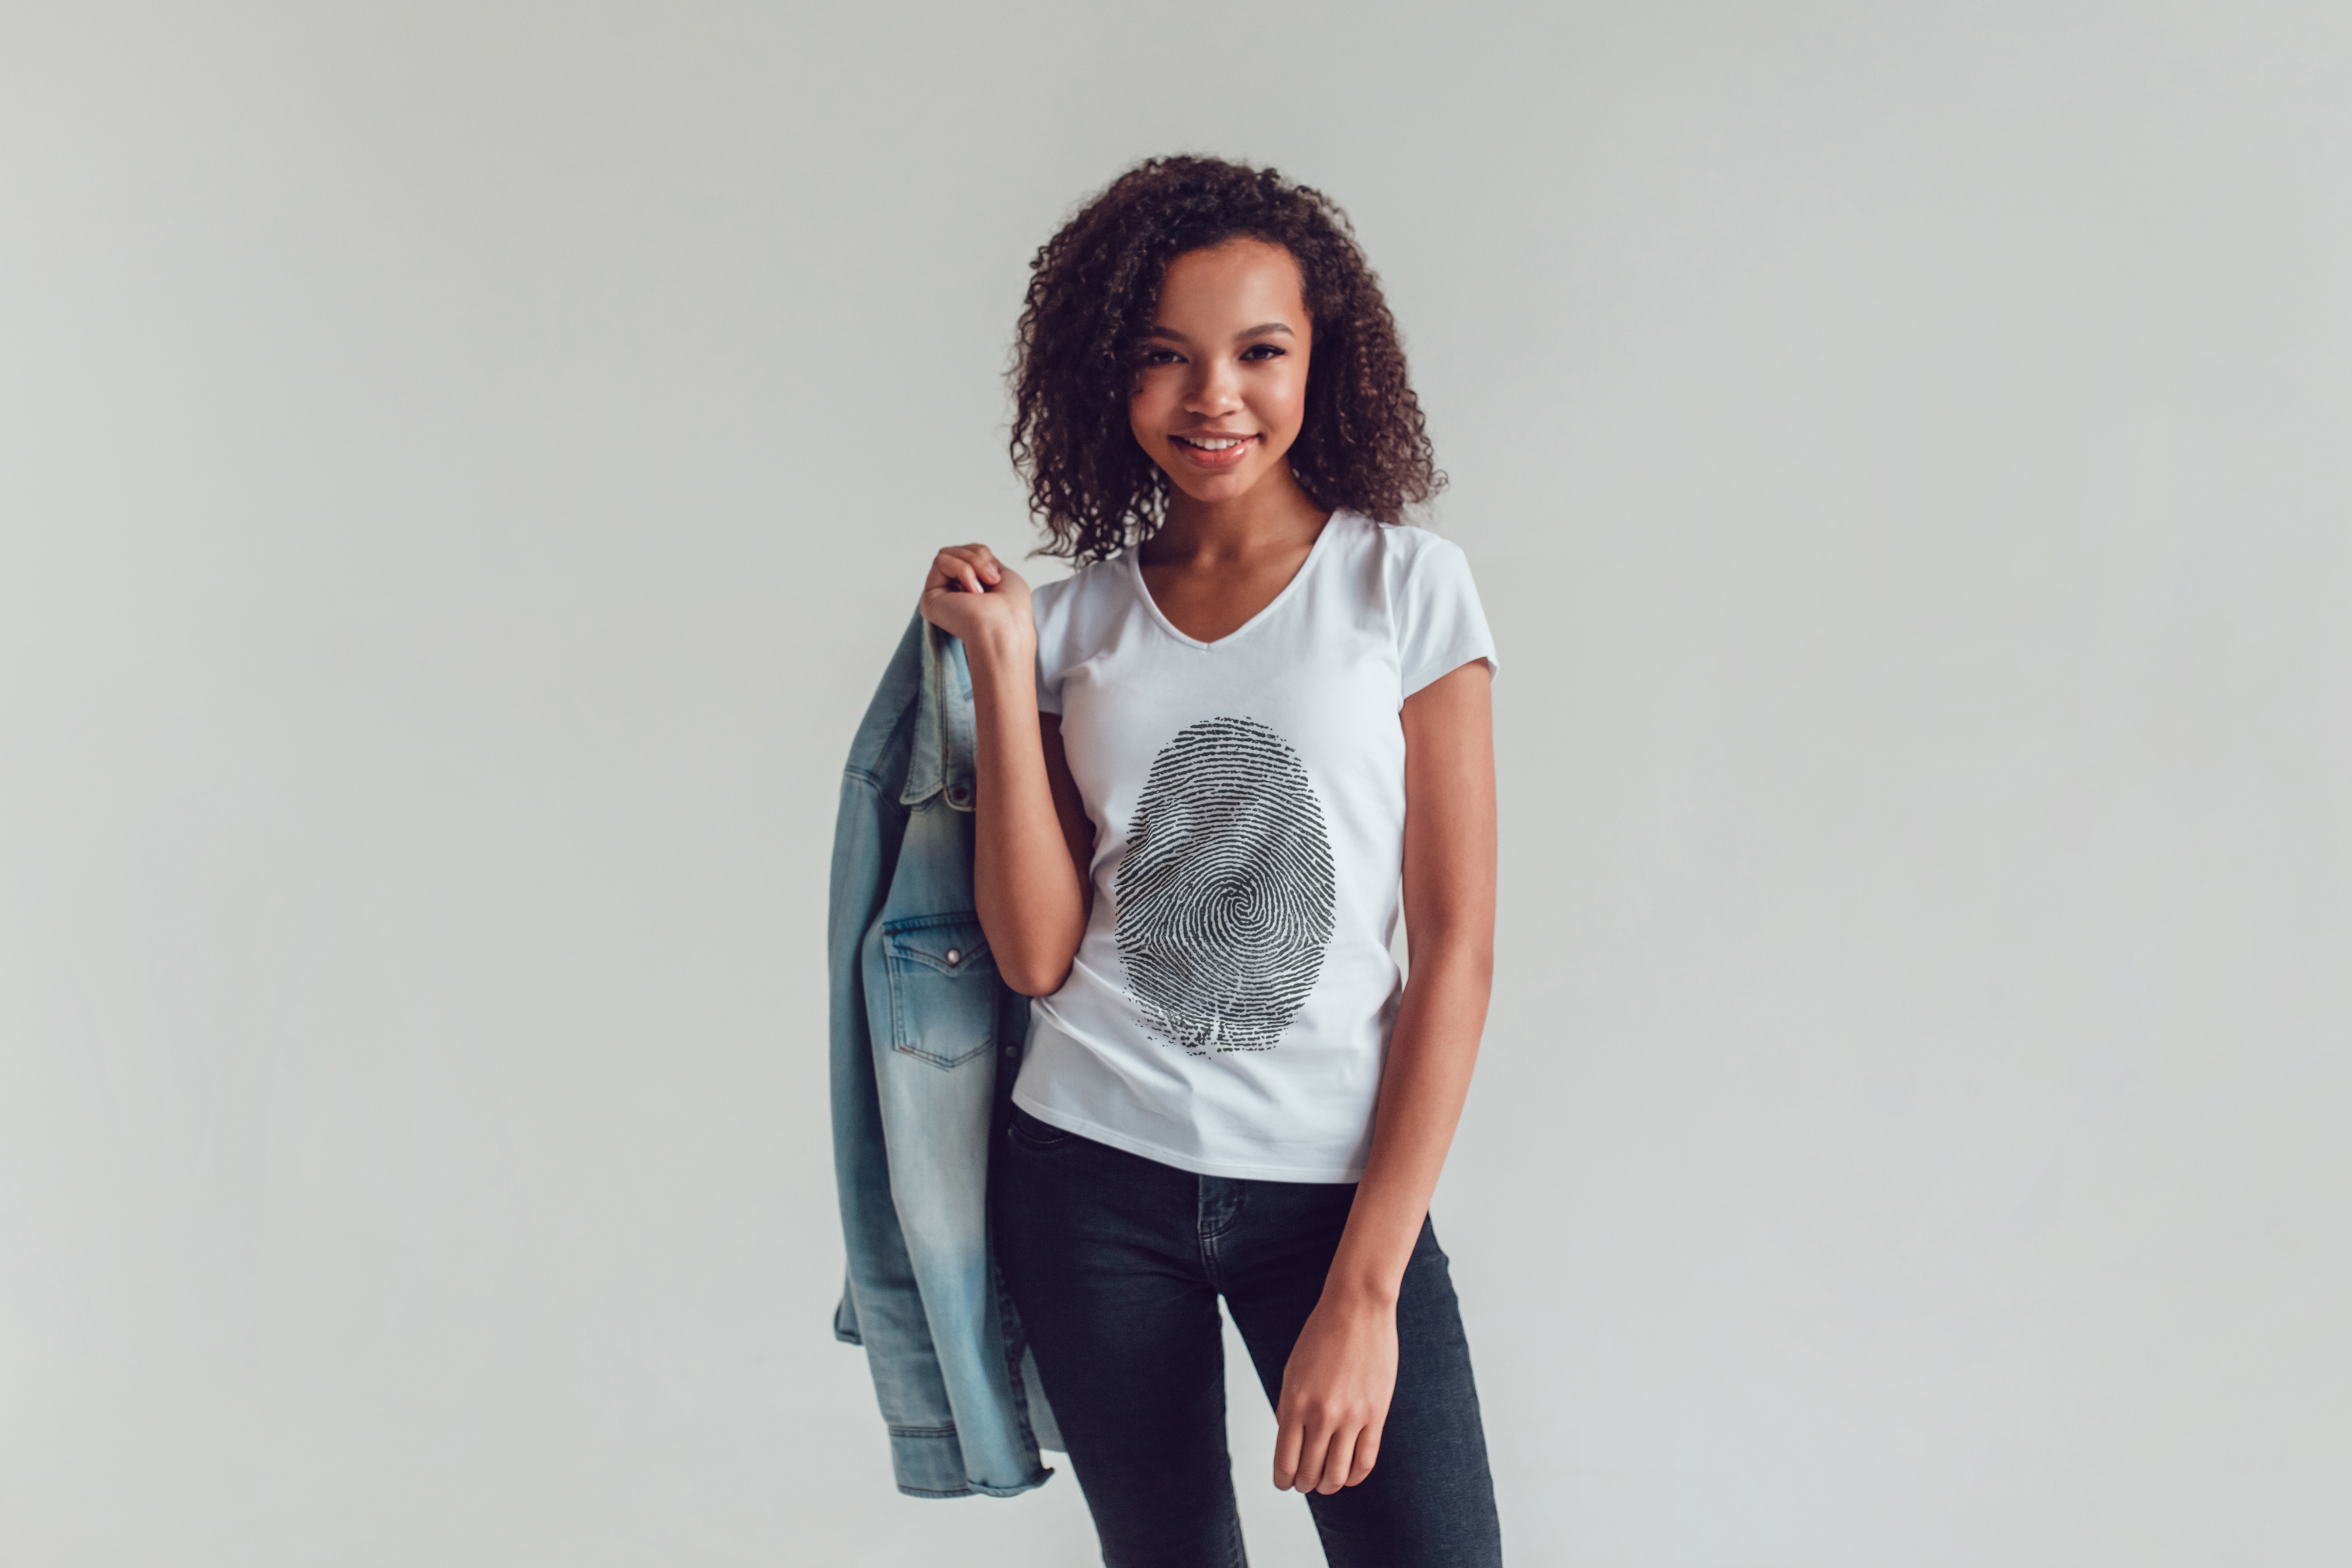 T-Shirt Mock-Up Vol.20 2017 example image 8